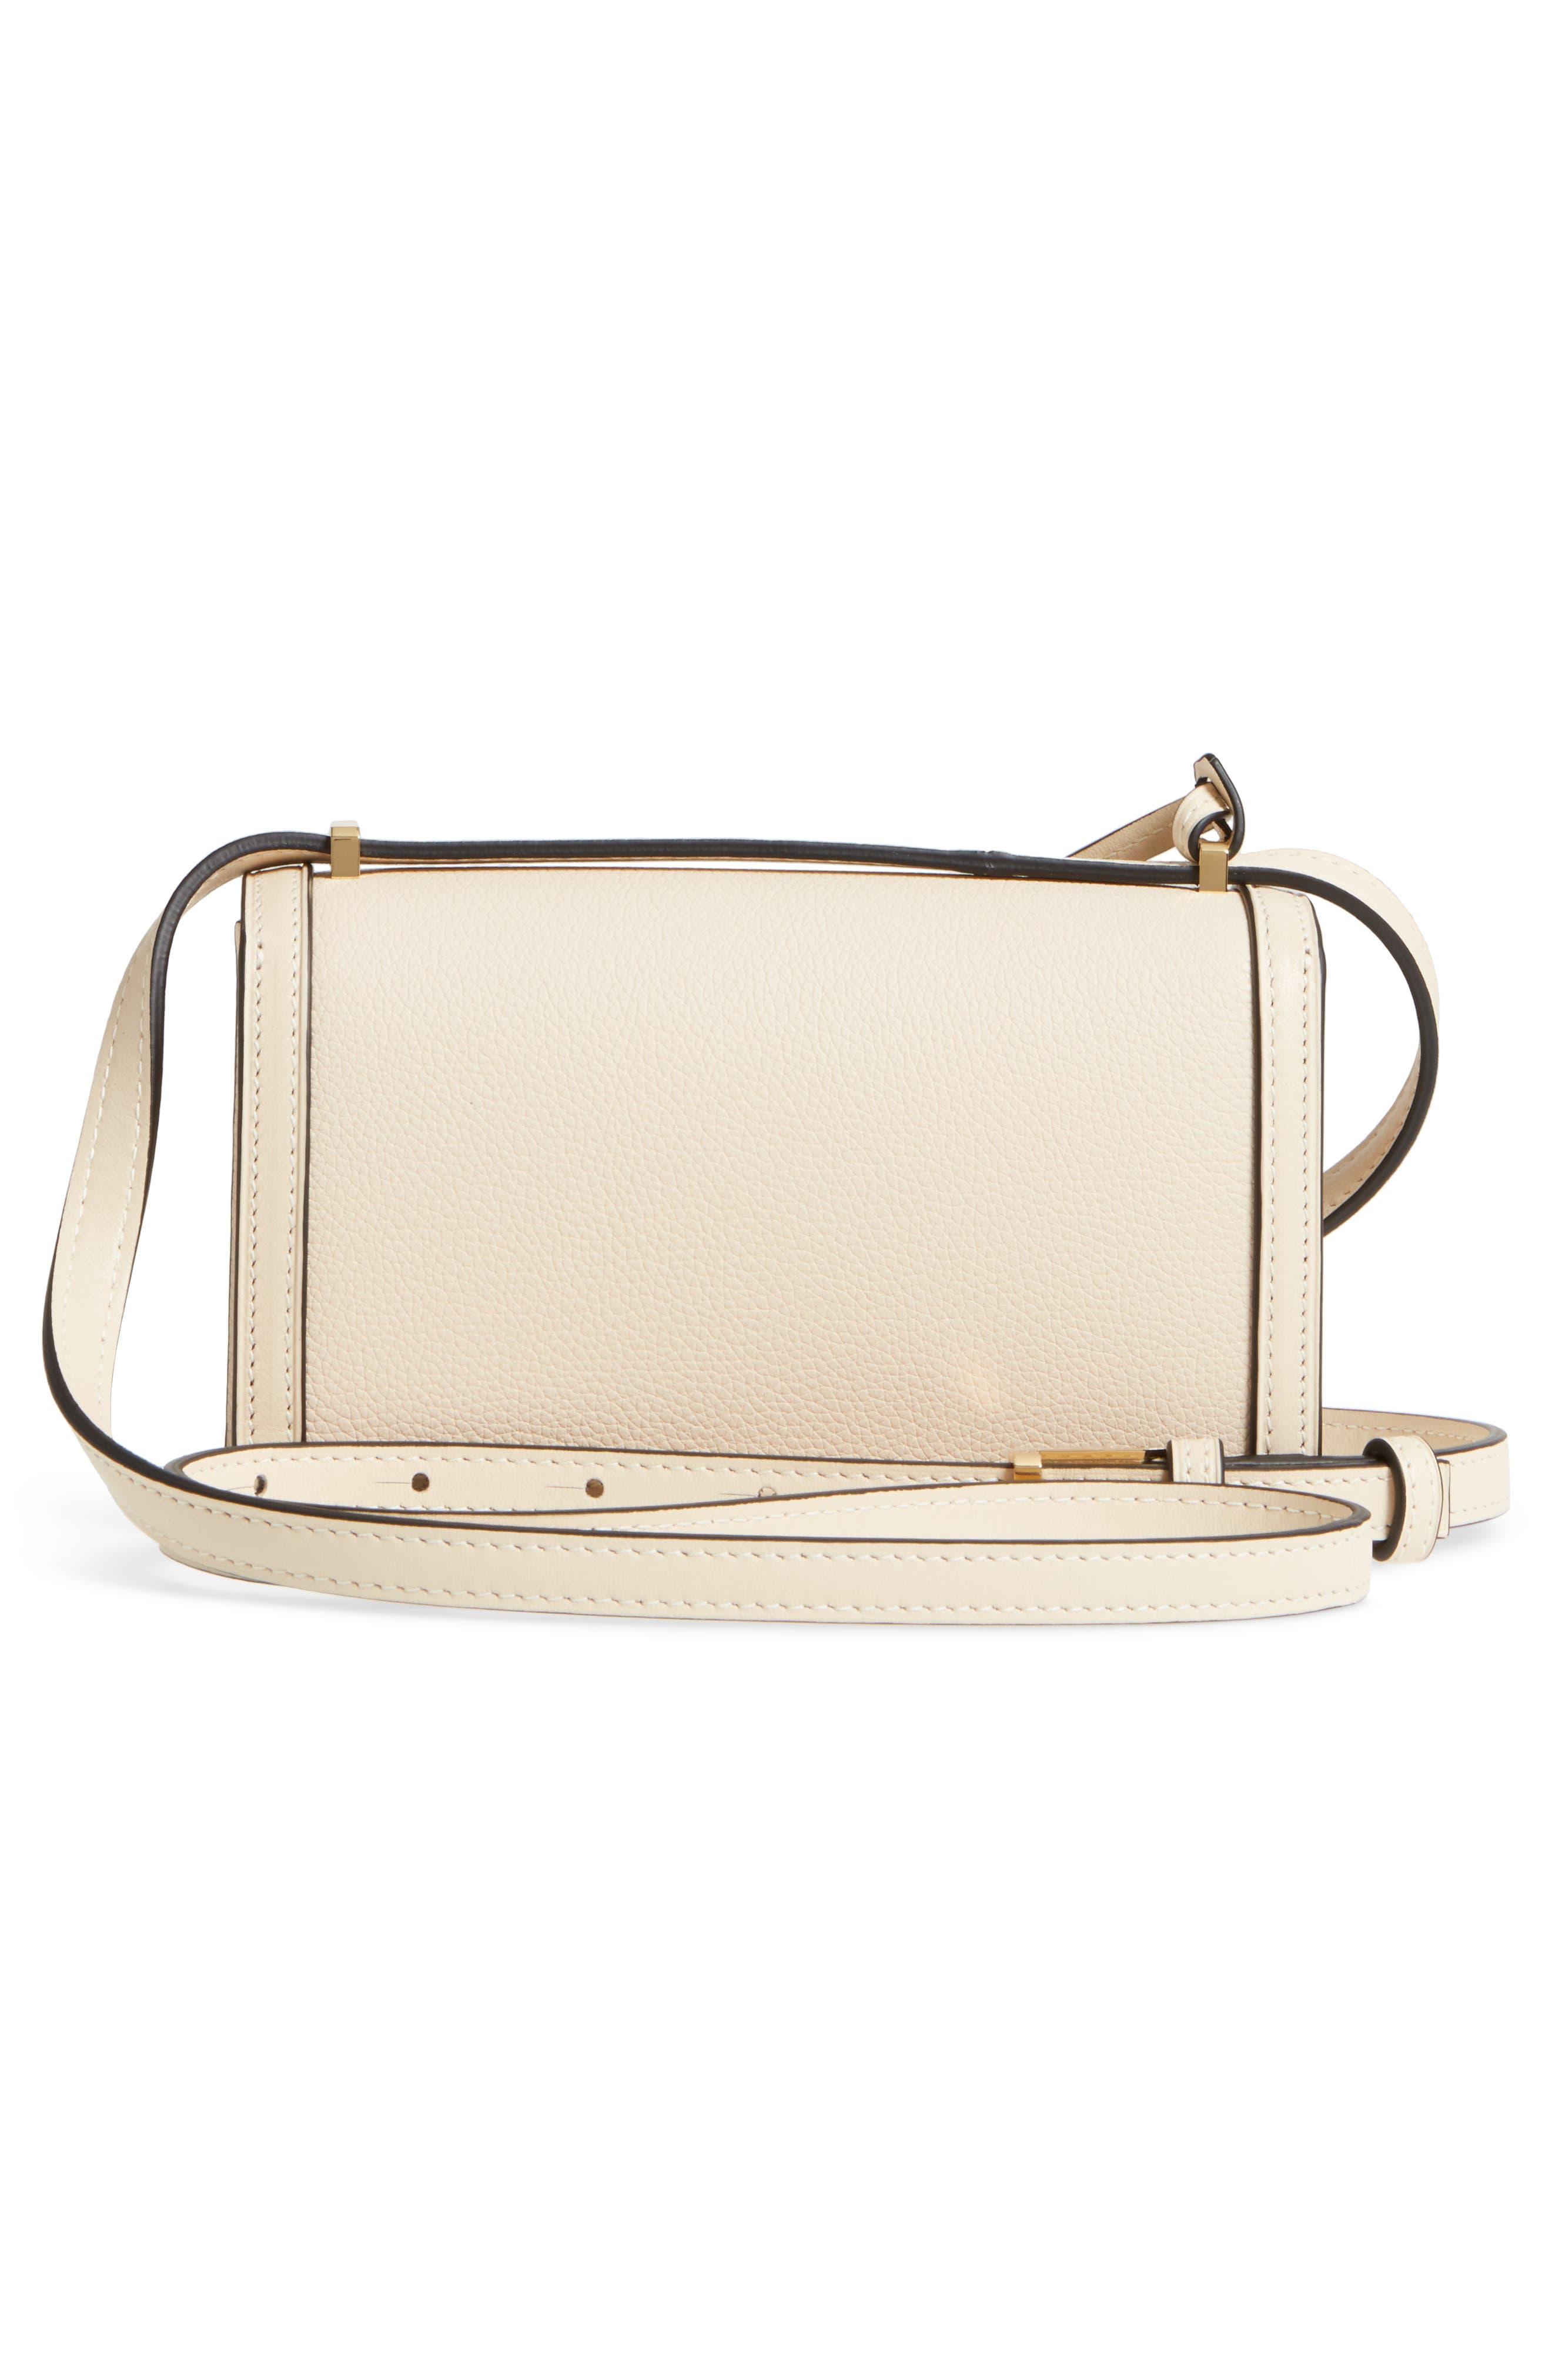 Alternate Image 3  - Loewe Small Barcelona Grainy Leather Crossbody Bag